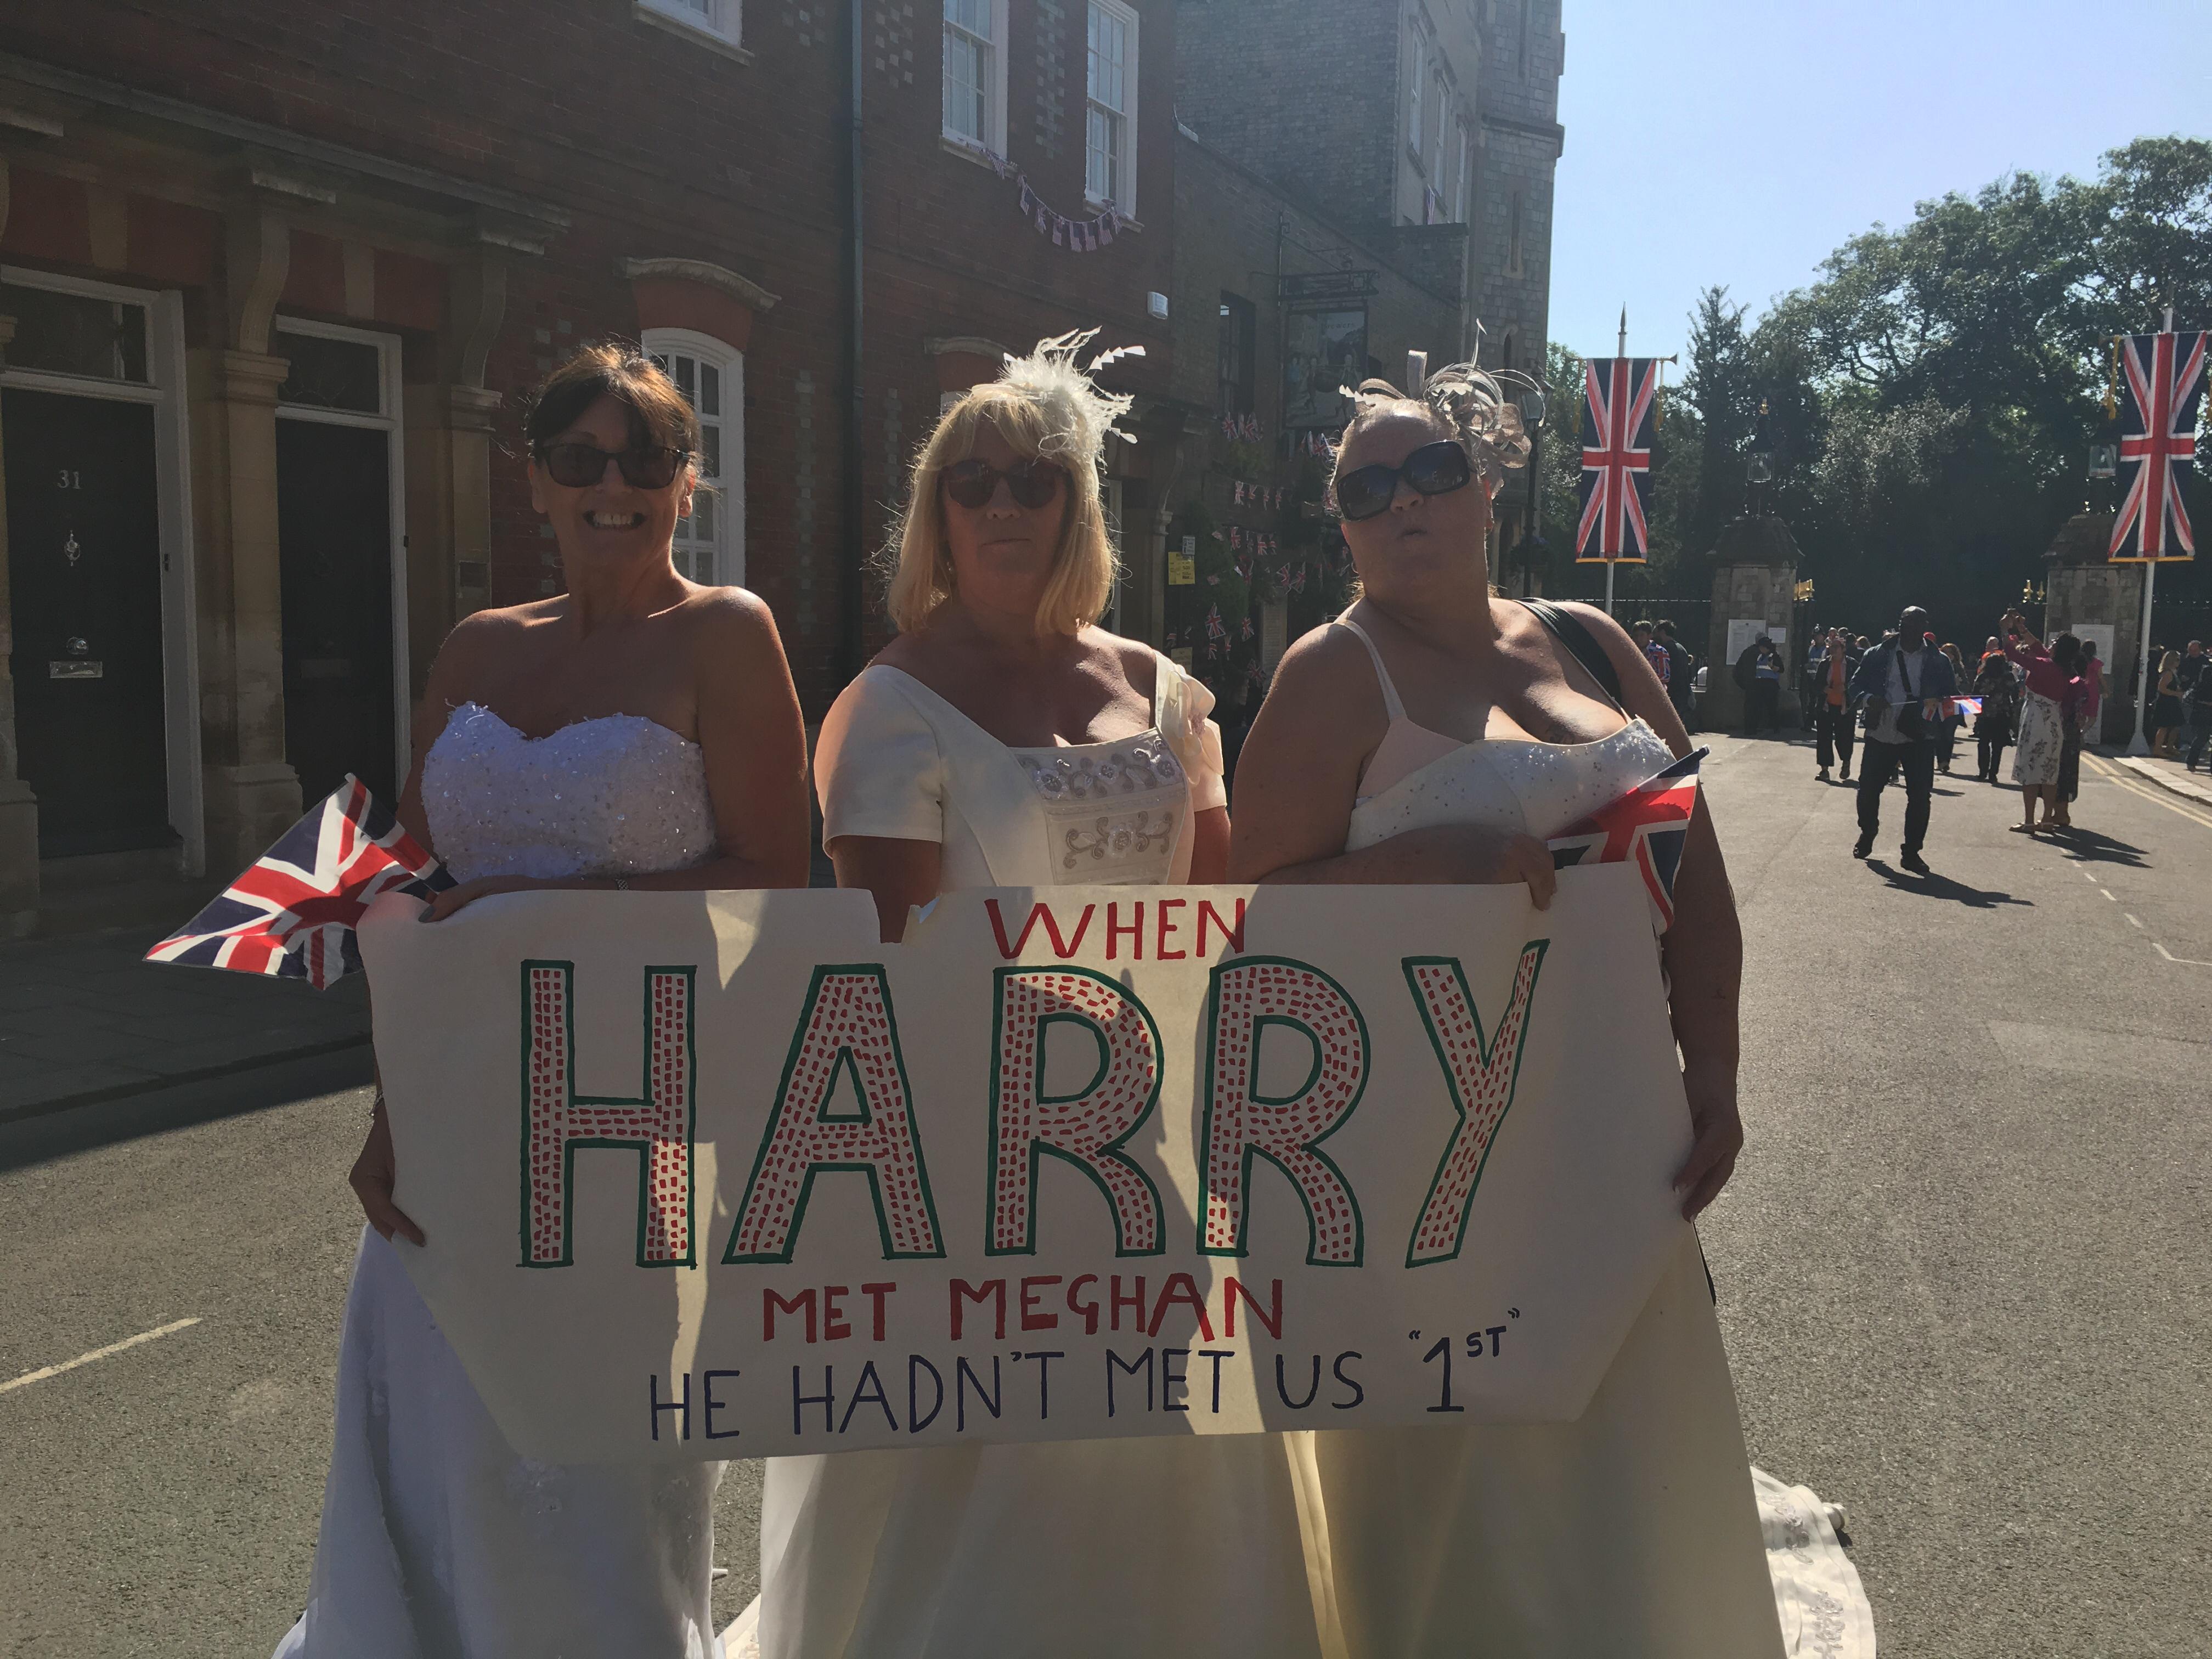 Sandra Shaw, Loraine Raines and Trish Hodkinson in Windsor on May 19, 2018.